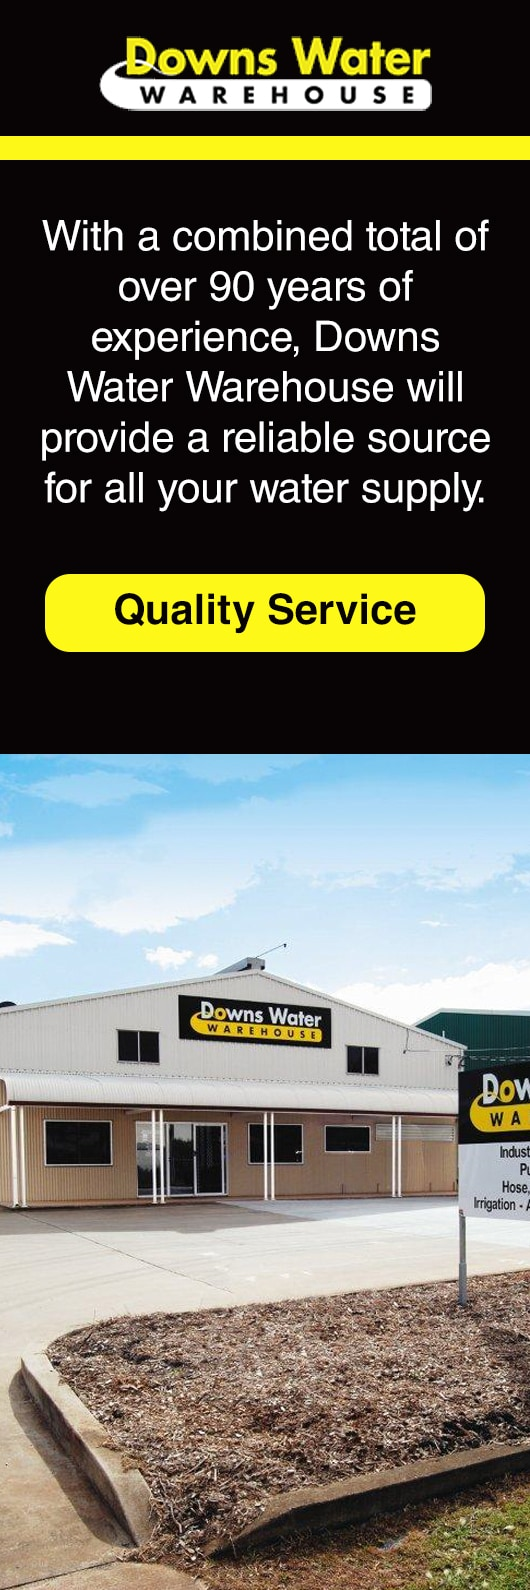 Downs Water Warehouse Pty Ltd - Irrigation & Reticulation